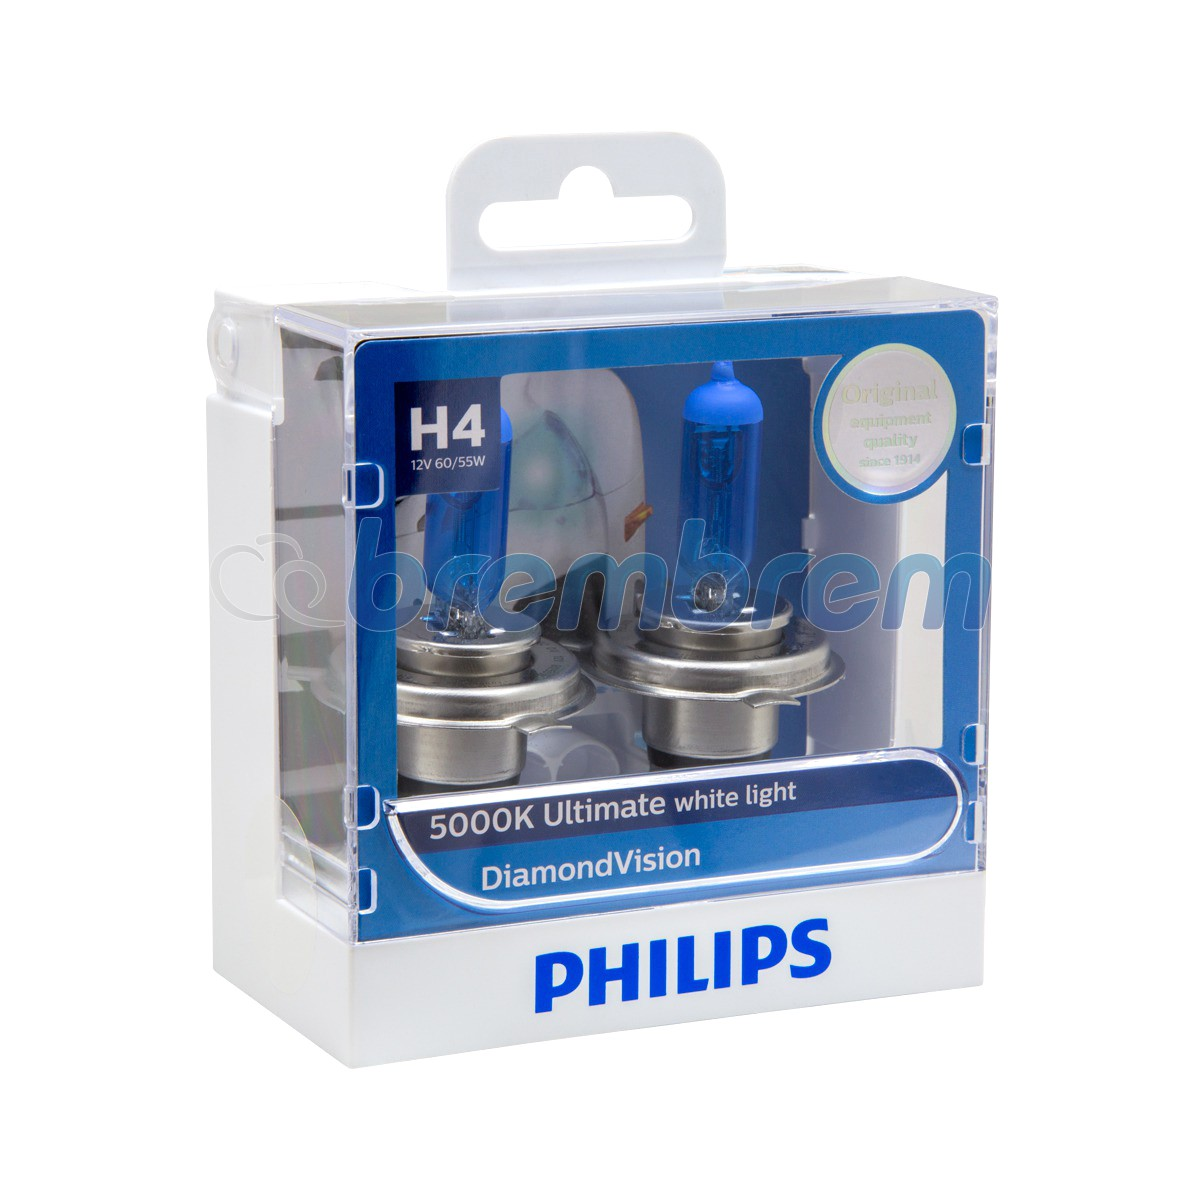 PHILIPS DIAMOND VISION H4 (5000K) - LAMPU HALOGEN